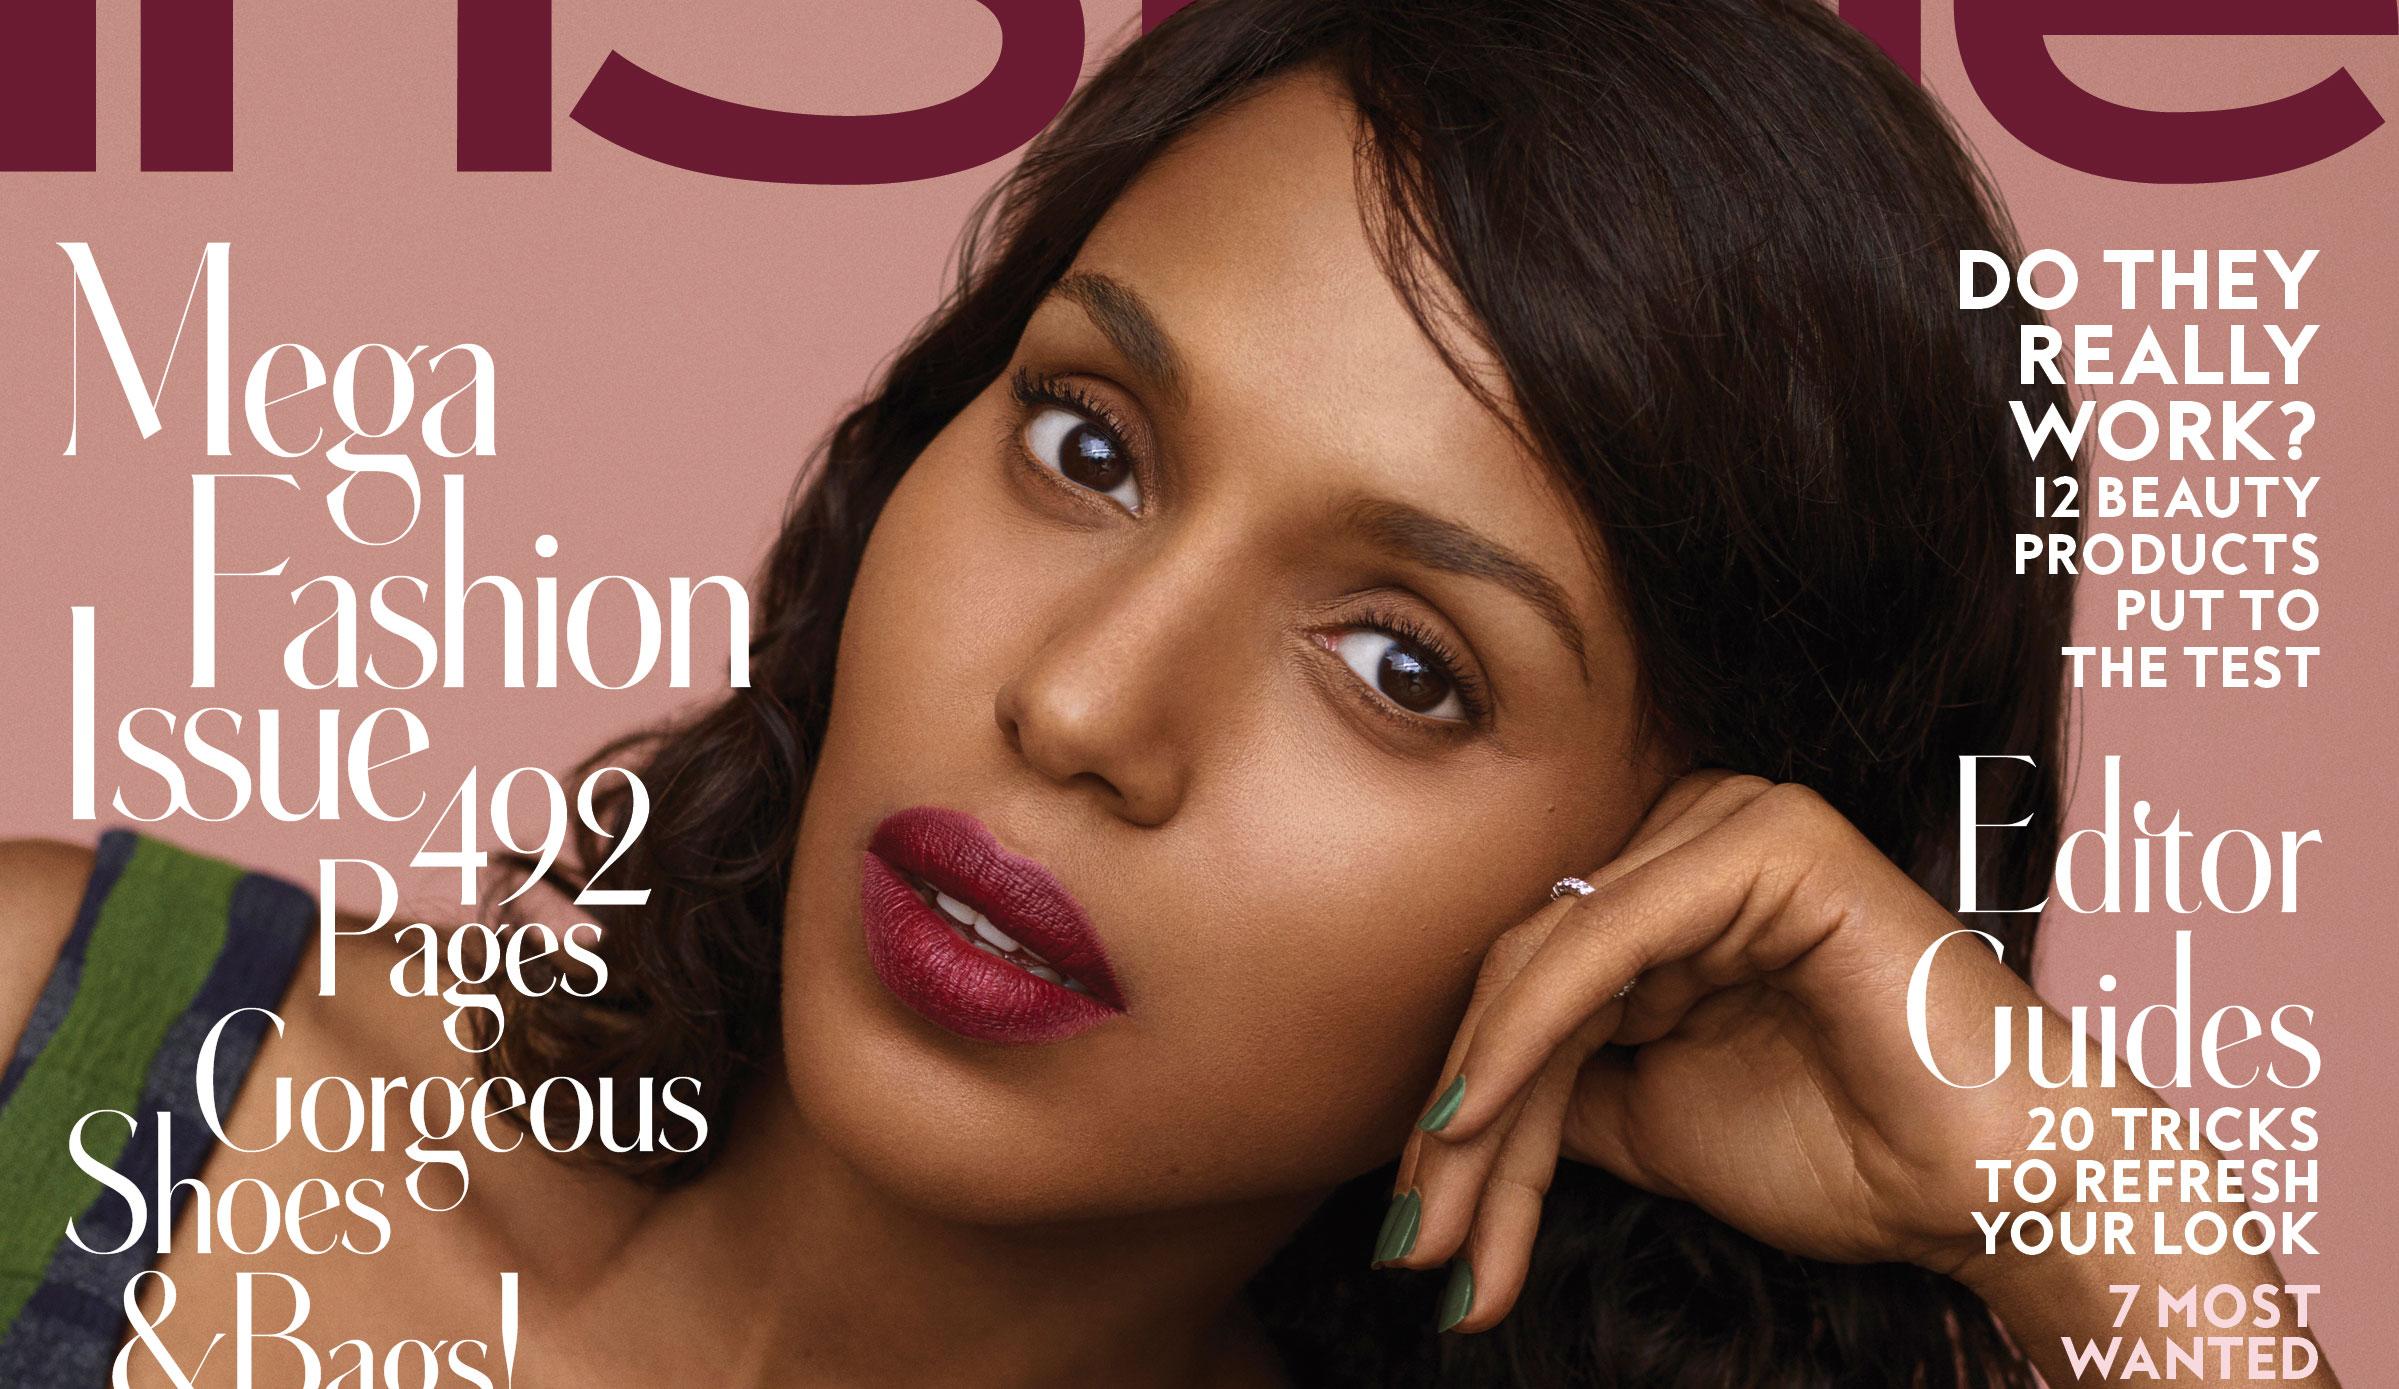 Kerry Washington Responds to InStyle Skin-Lightening